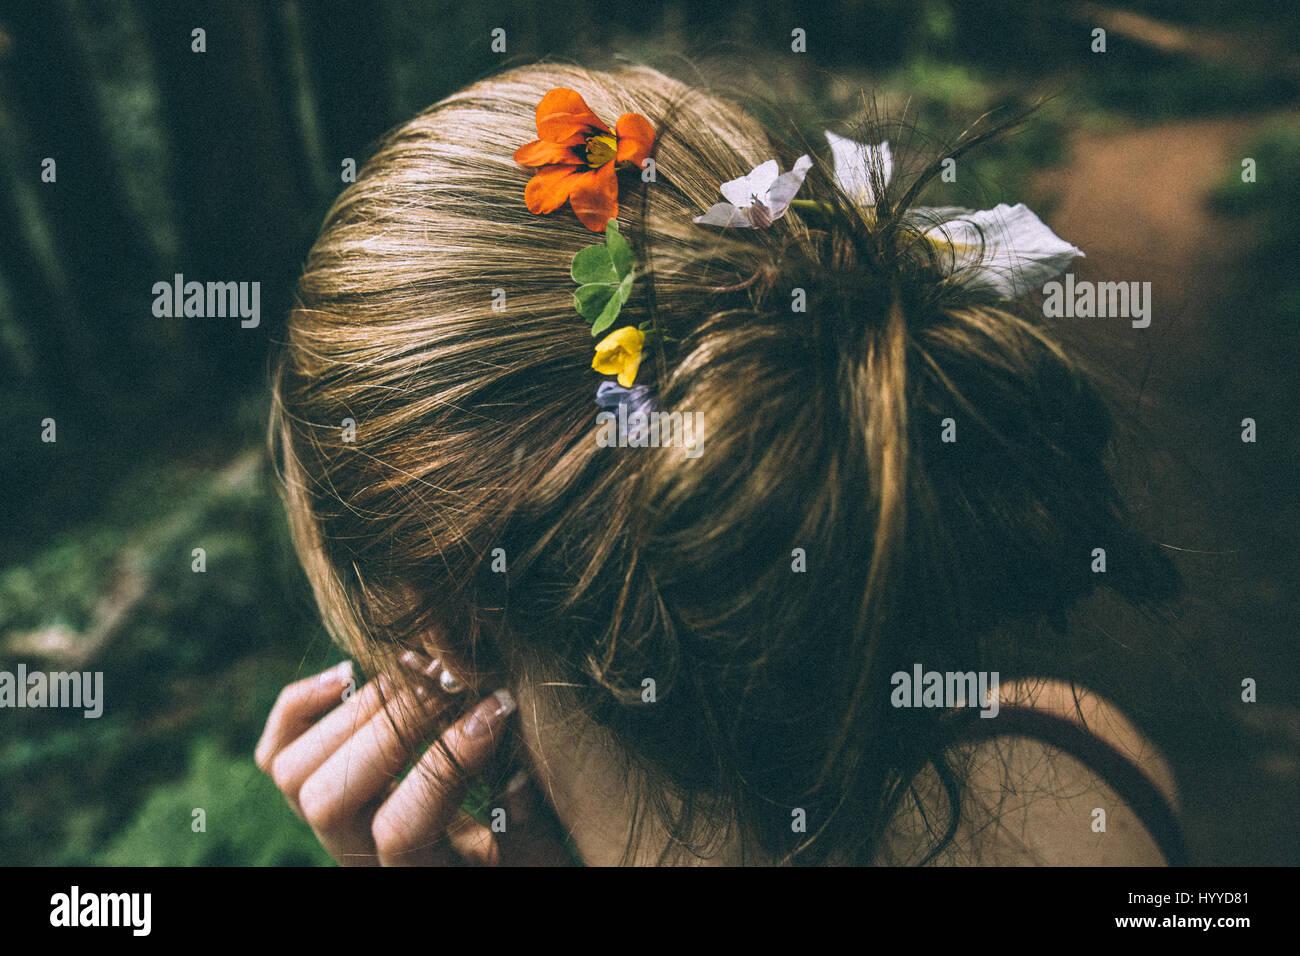 Blumen im Haar - Muir Woods National Monument, Mill Valley, San Francisco, Kalifornien, USA Stockbild